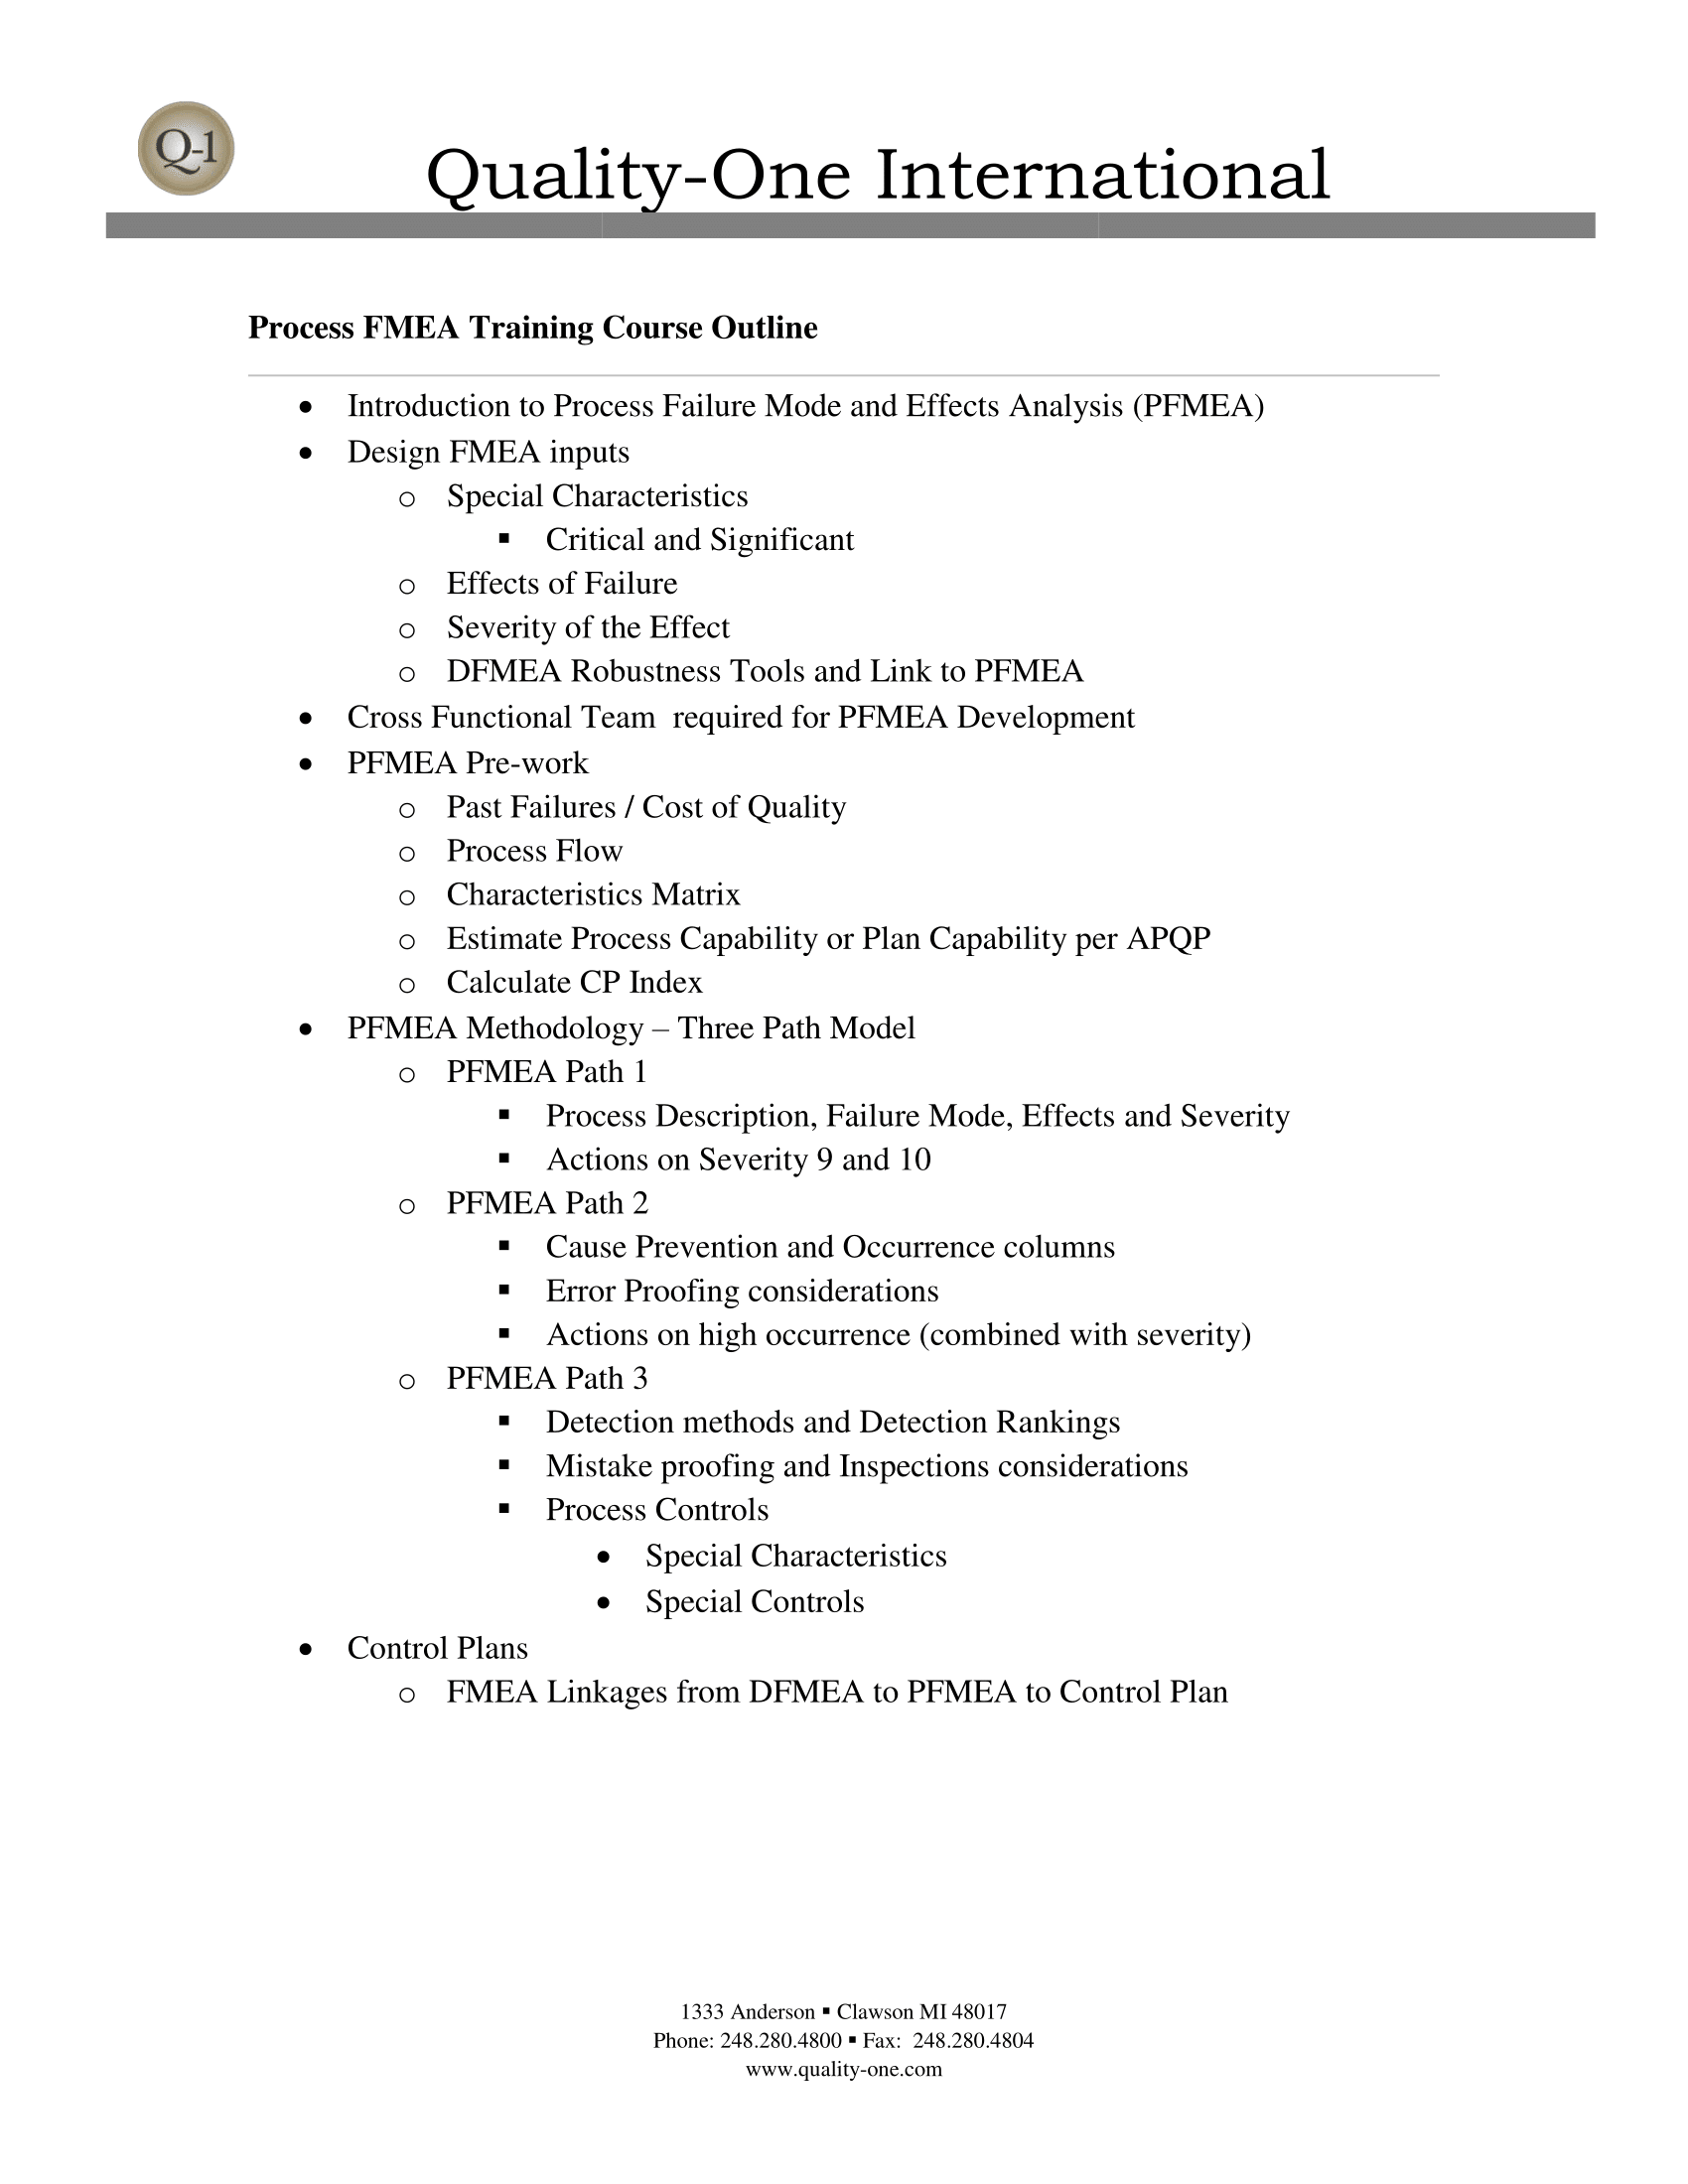 Process FMEA Training Course Outline